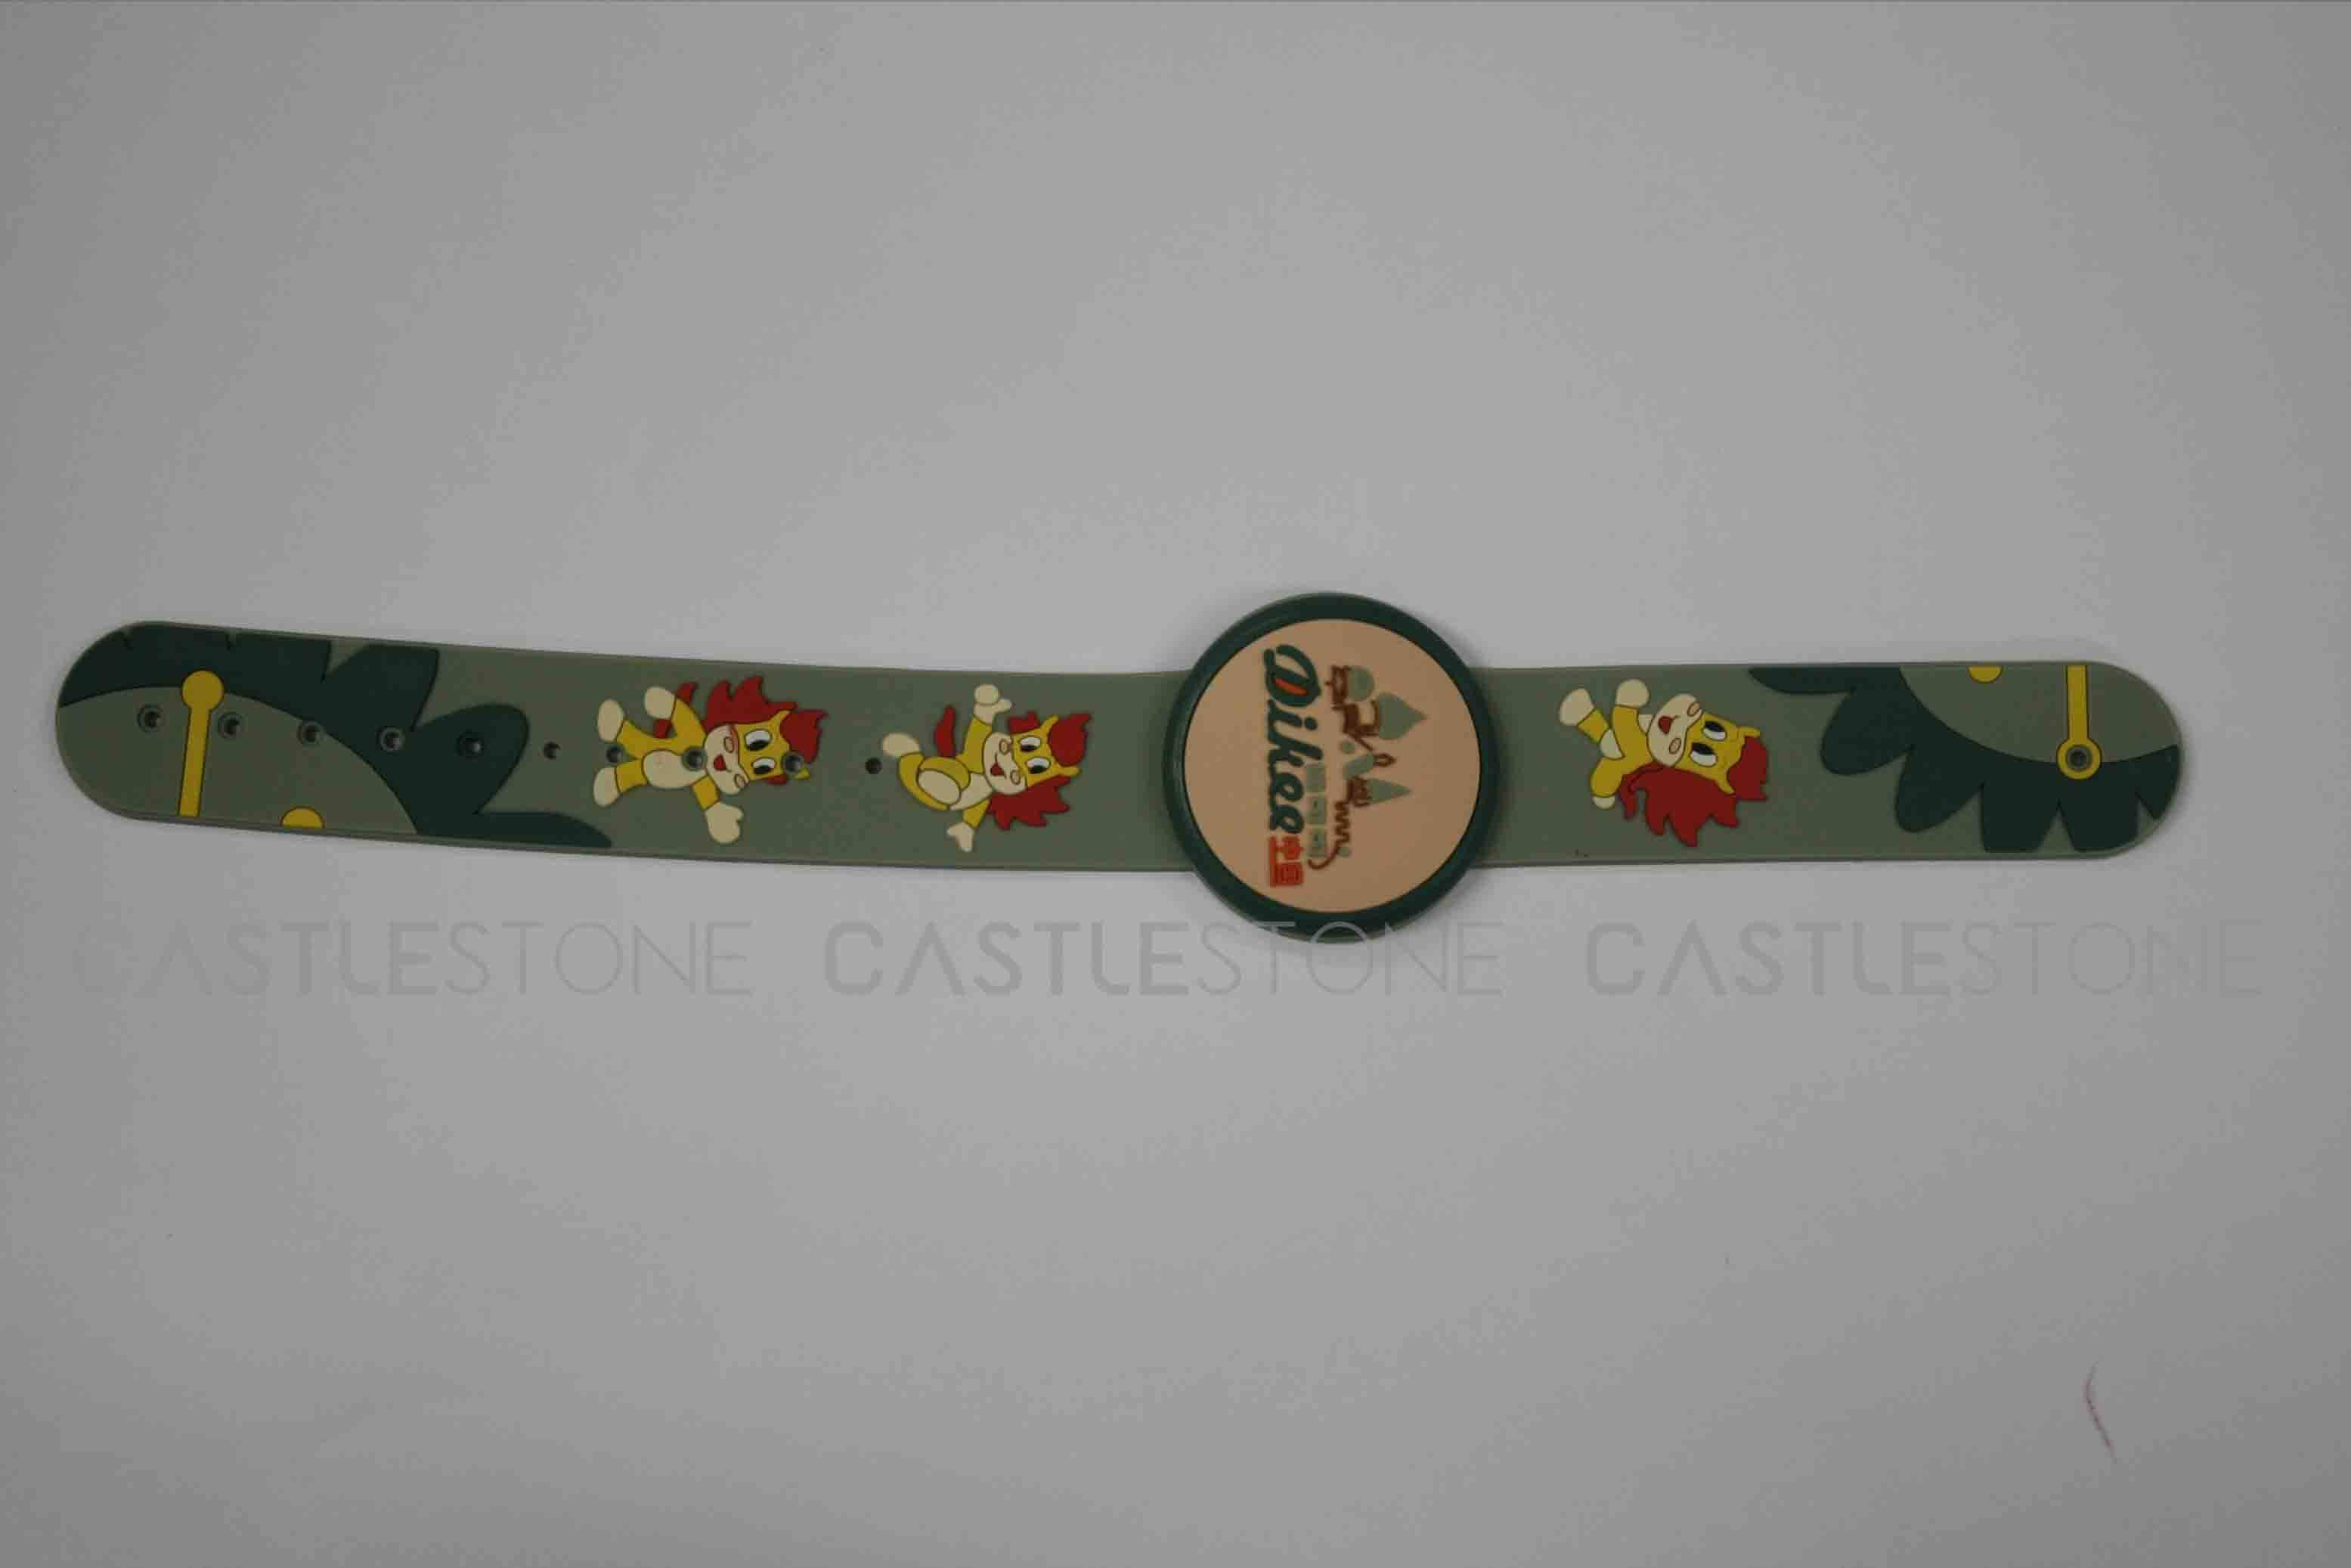 Excellent quaility RFID PVC wristband